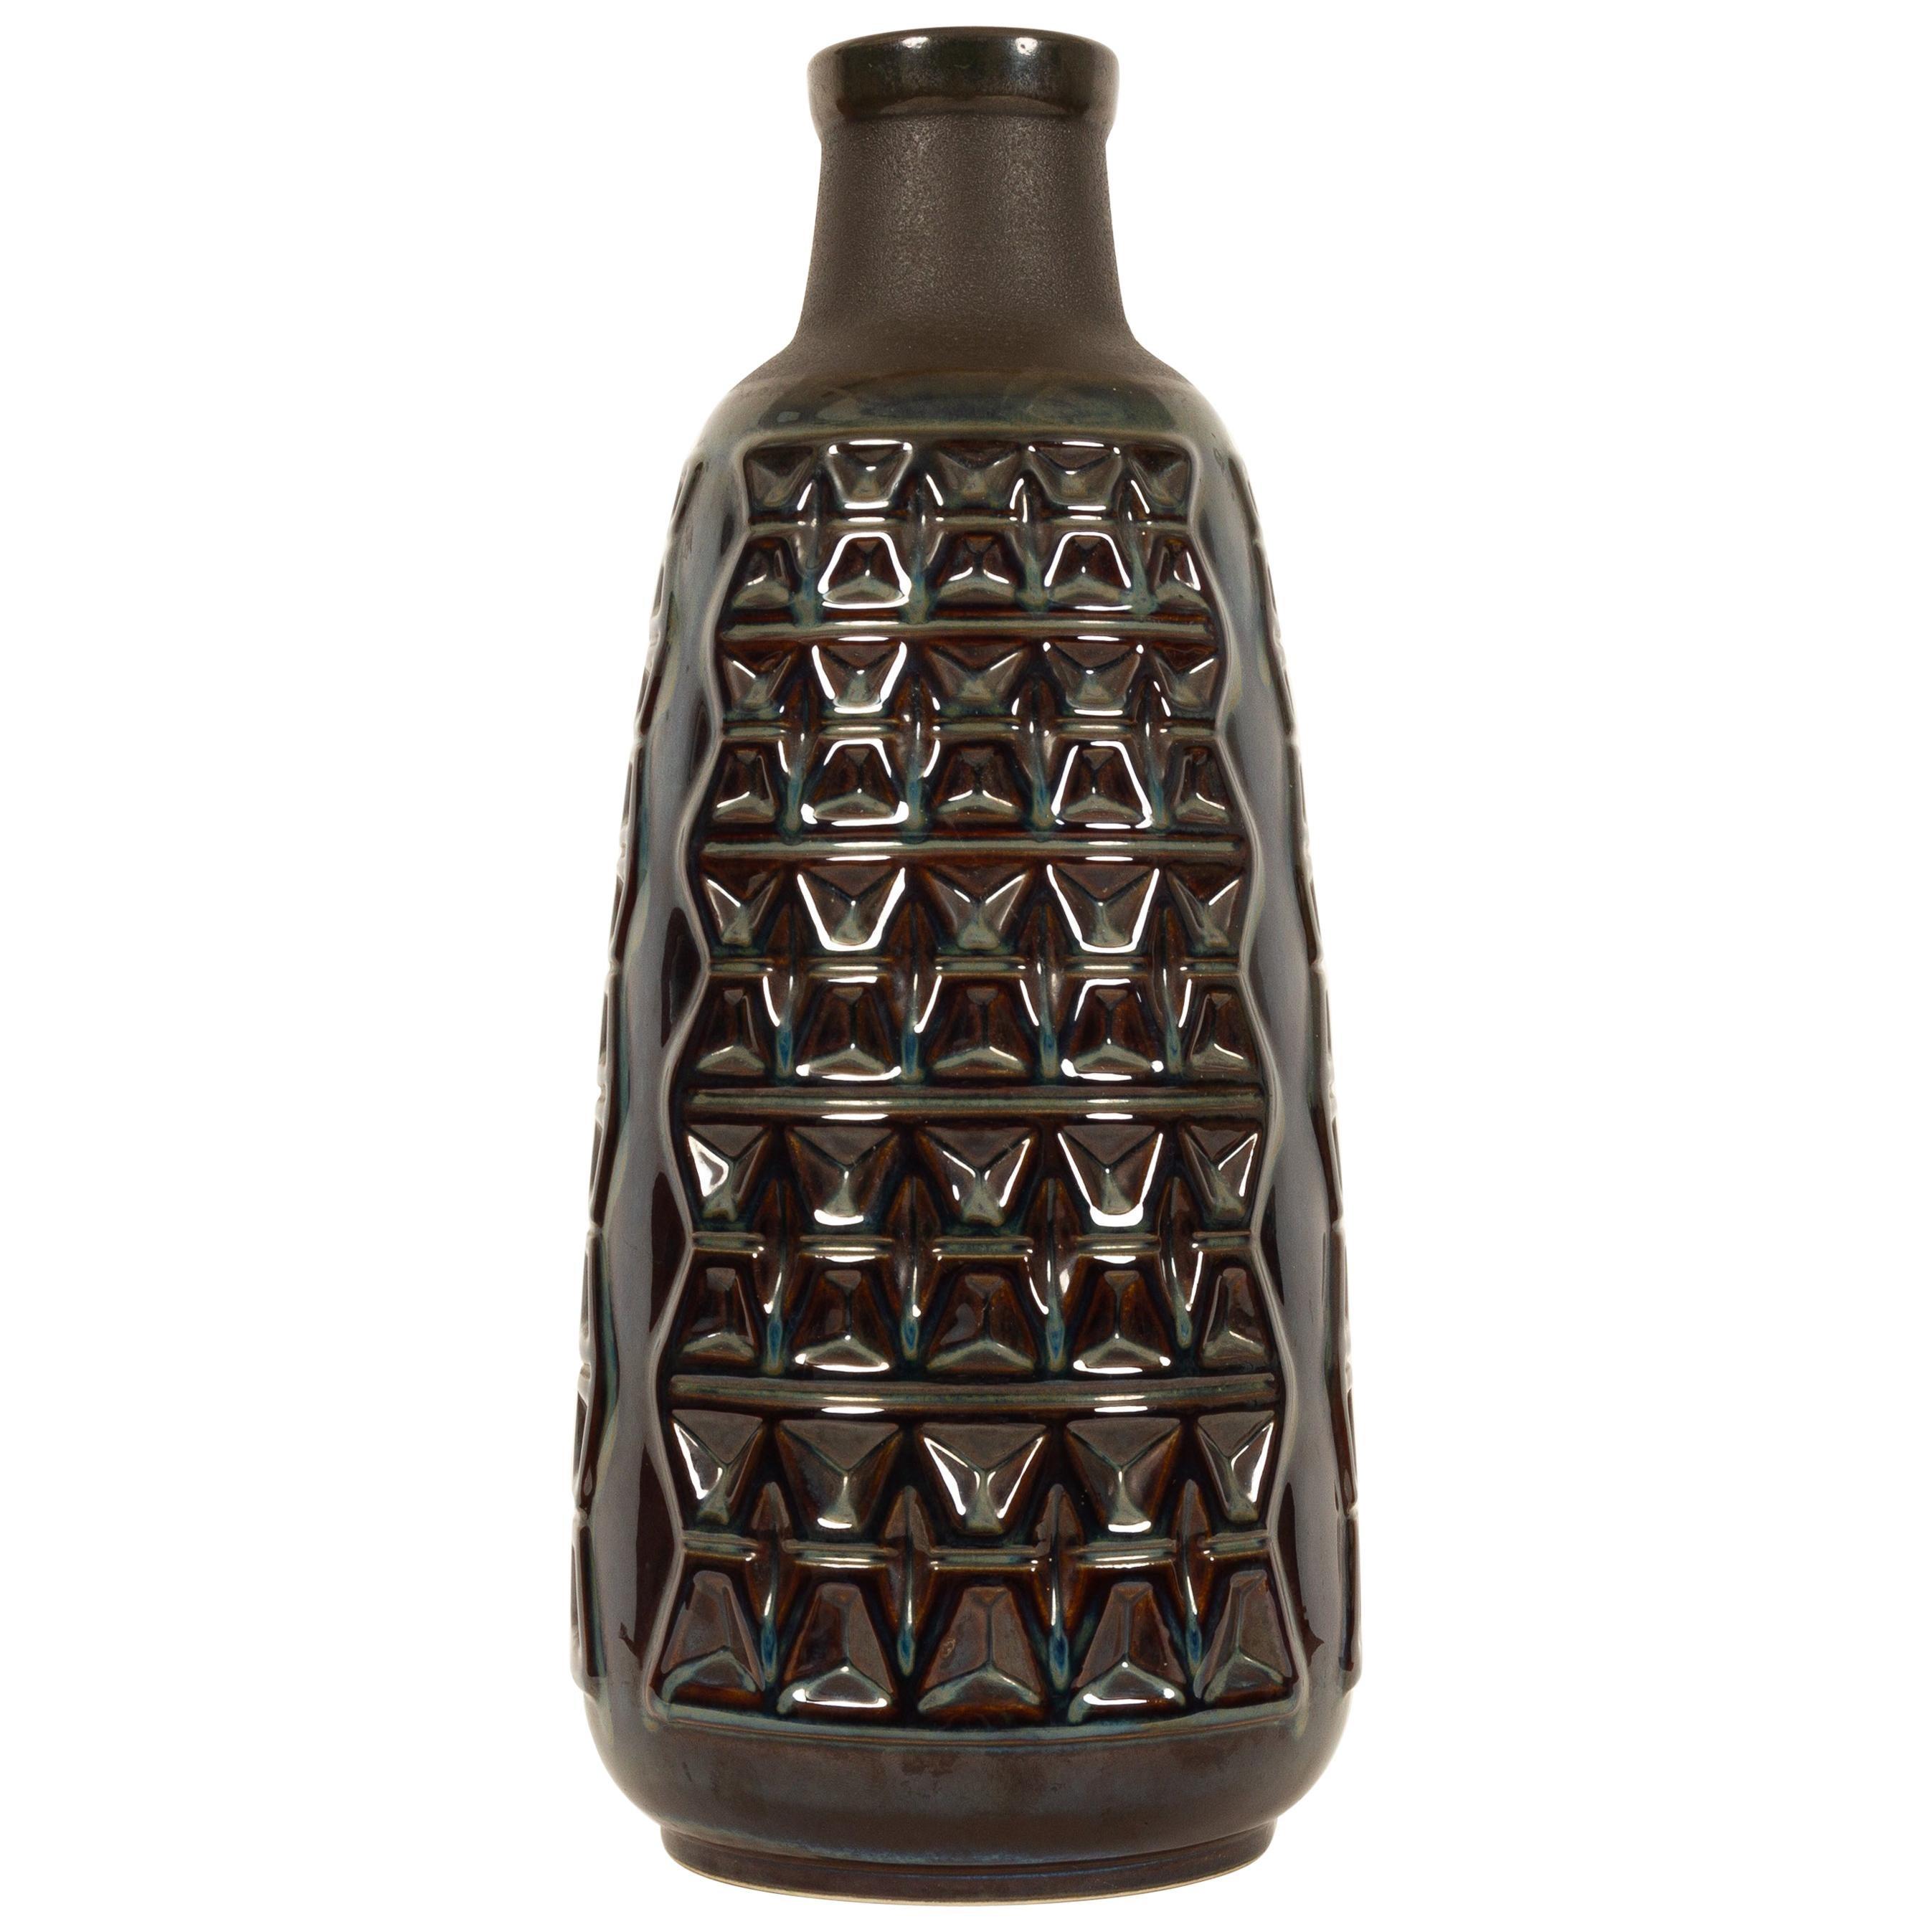 Large Danish Ceramic Vase in Blue Glaze by Einar Johansen for Søholm 1960s